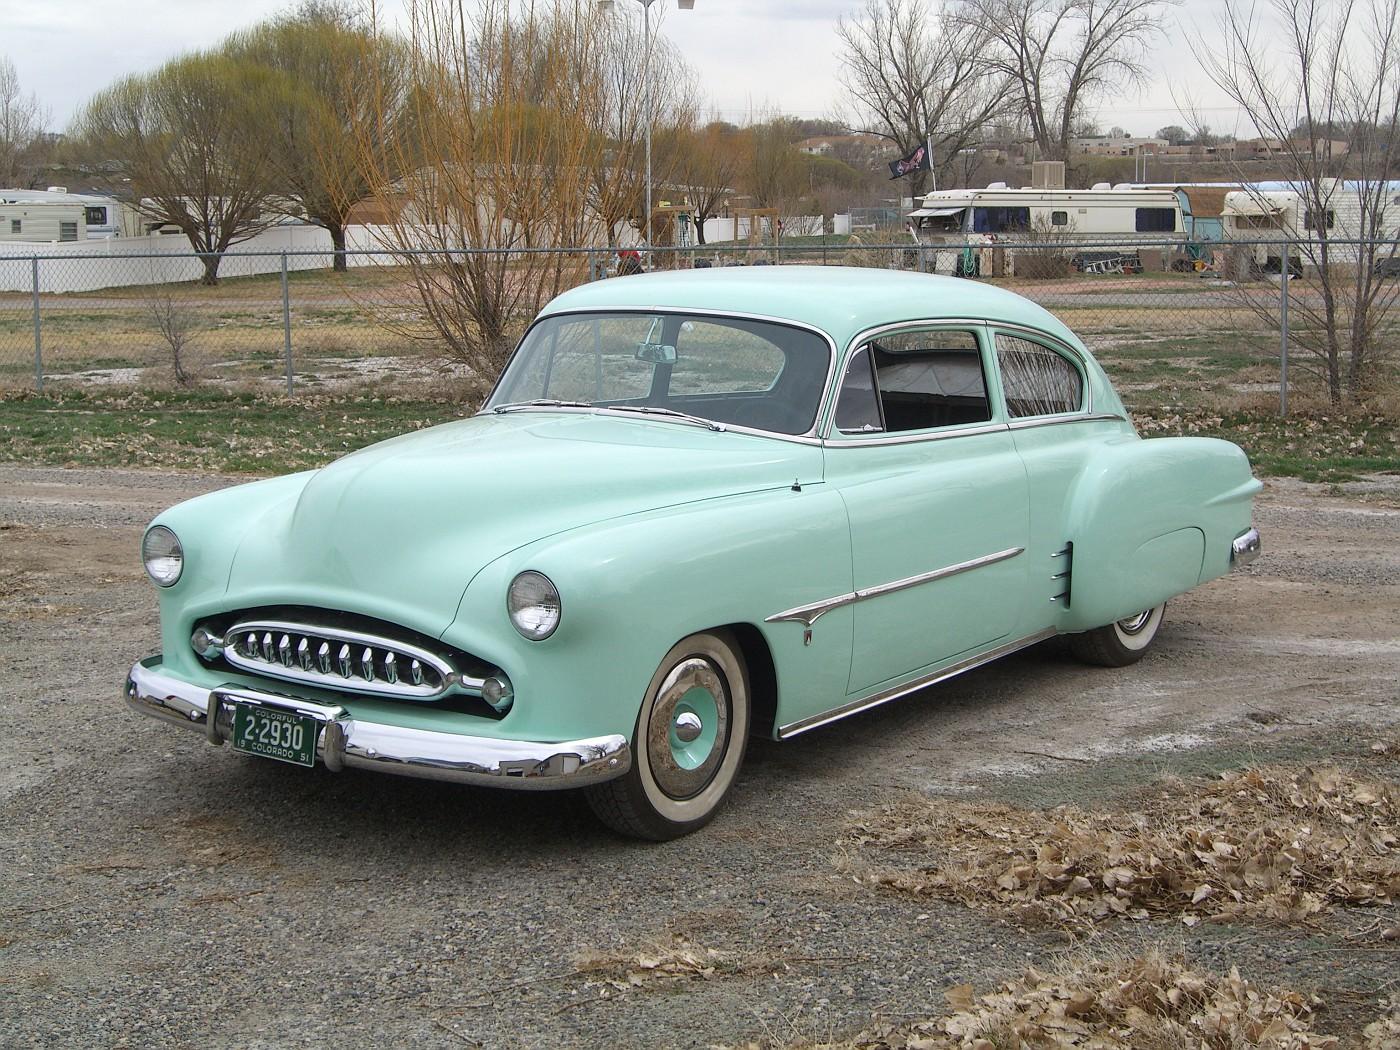 Coupe 1951 chevy coupe parts : 51 Chevy Coupe Parts Images - Reverse Search